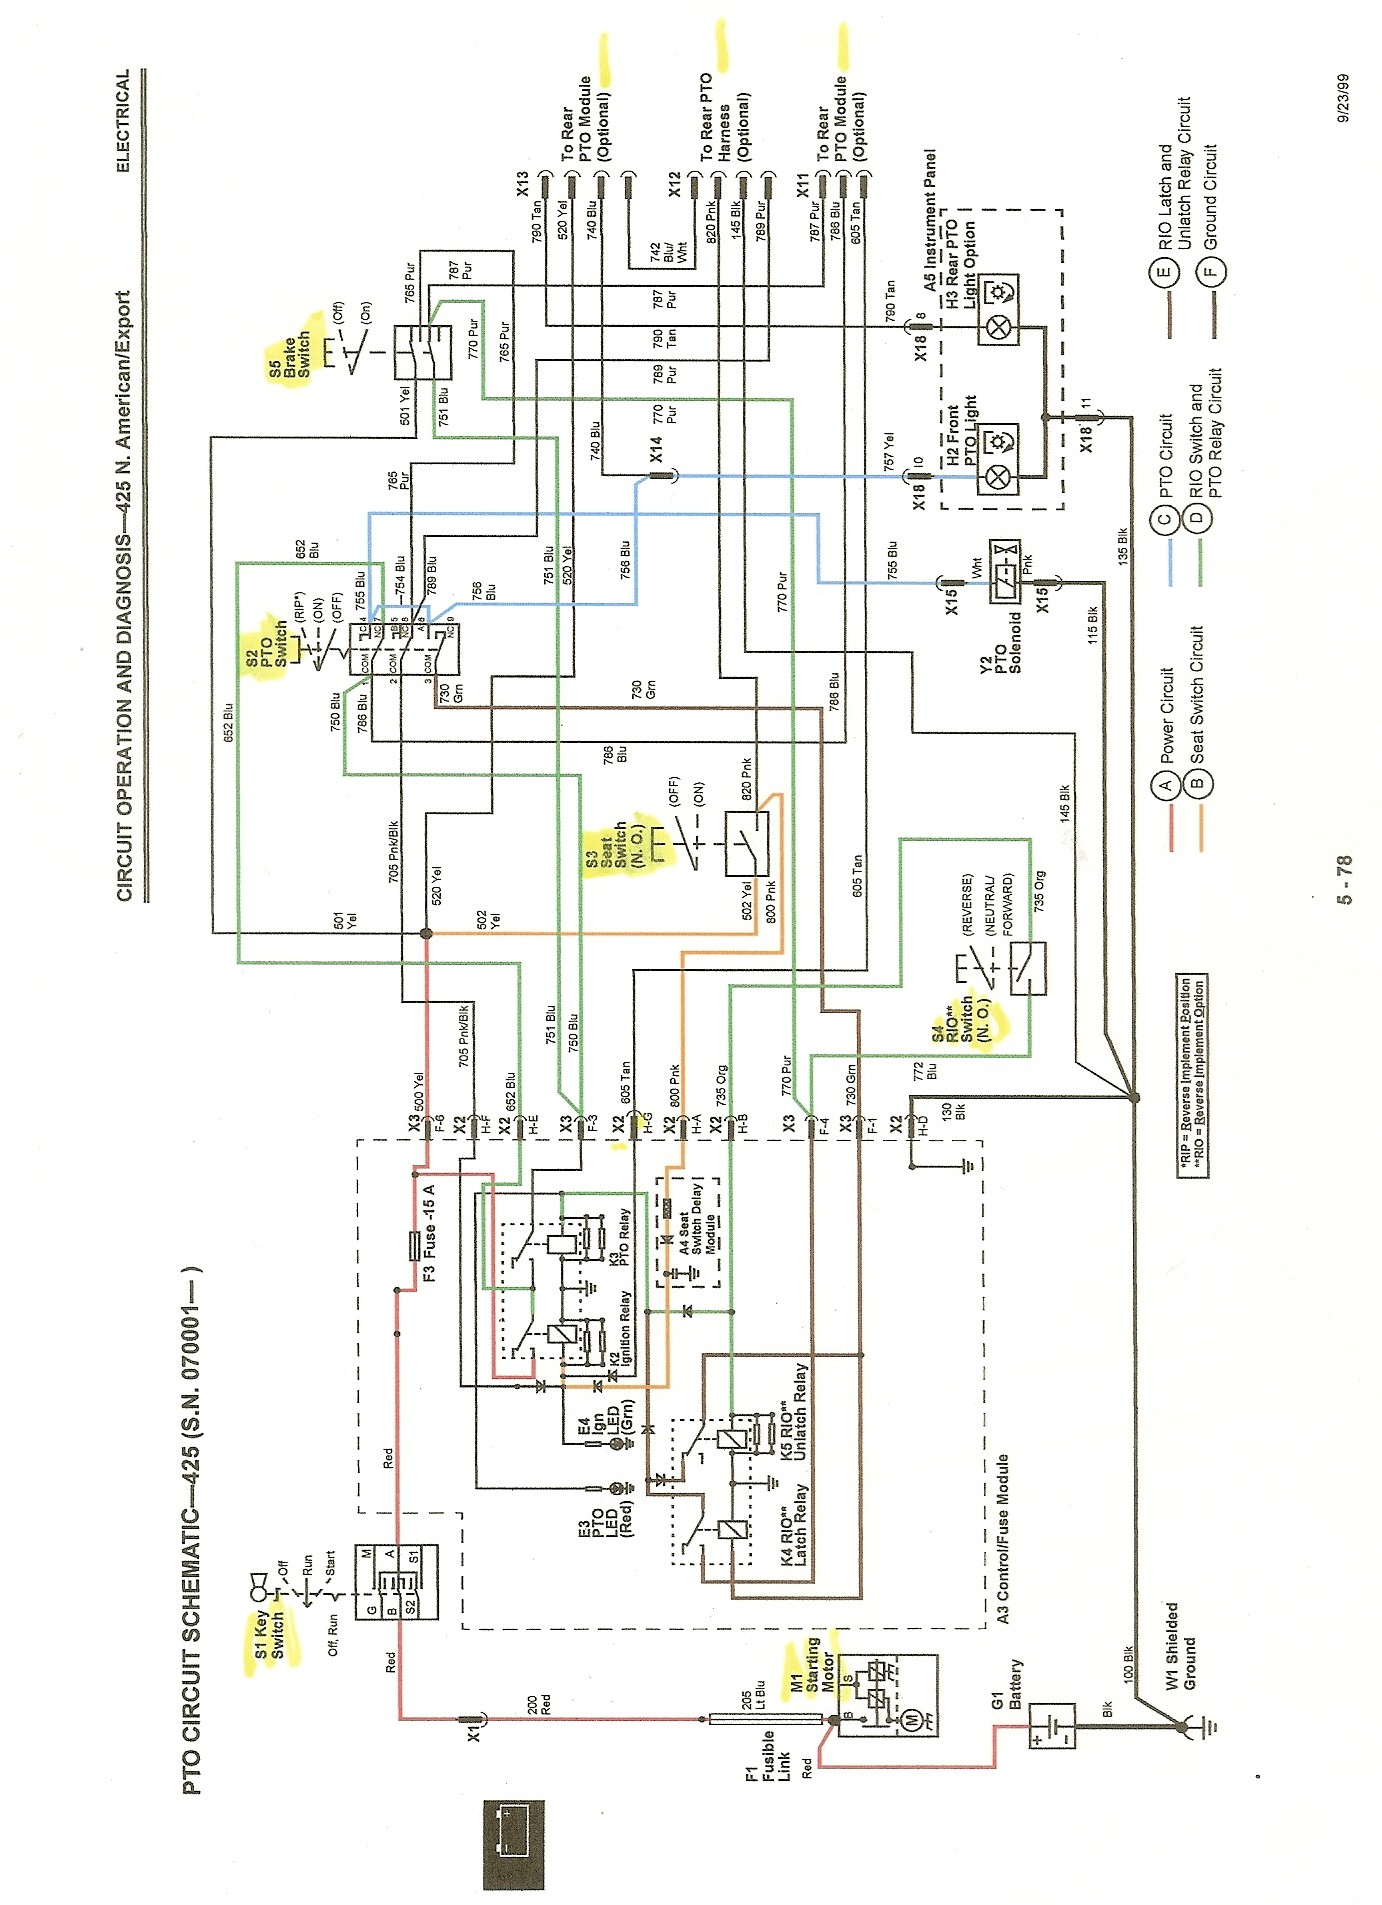 John Deere 345 Wiering Diagram 425 Ignition Motor Cranks when Key is Turned to Run Of John Deere 345 Wiering Diagram